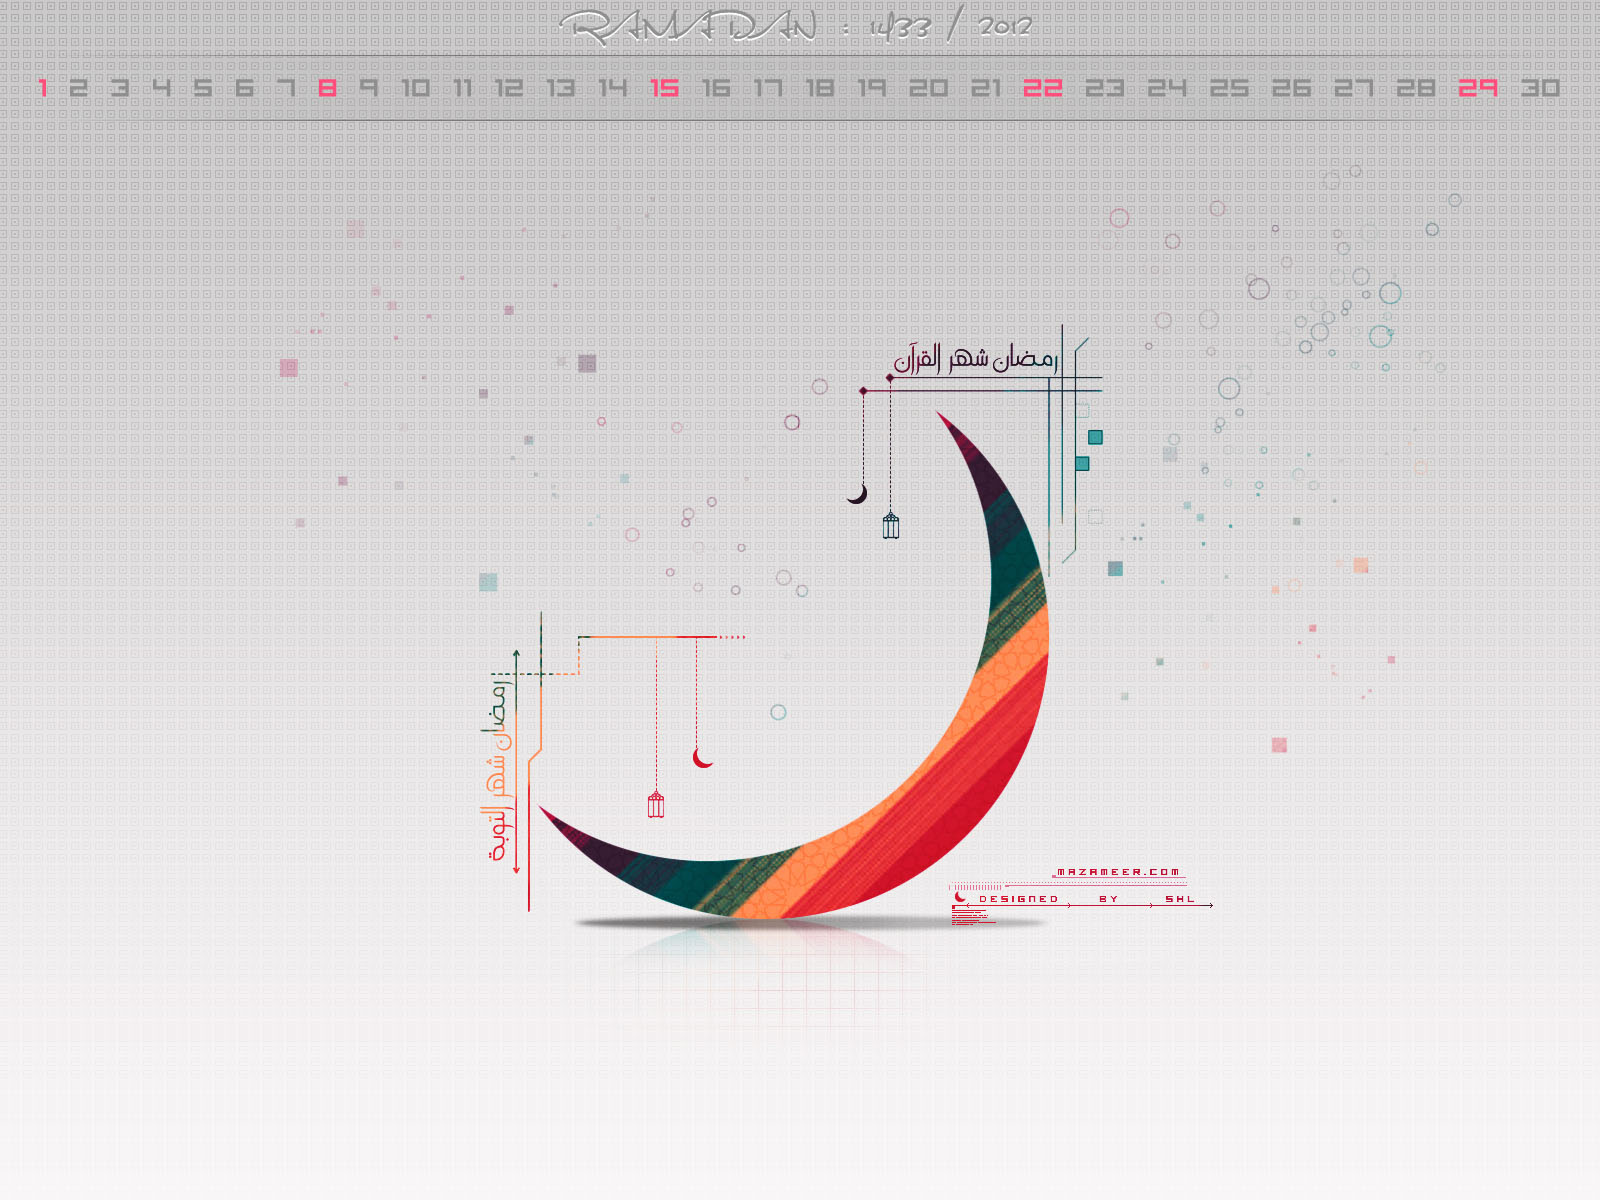 20 latest and beautiful ramadan wallpapers 2017 eid mubarak 2017 ramadan wallpapers 2017 kristyandbryce Image collections